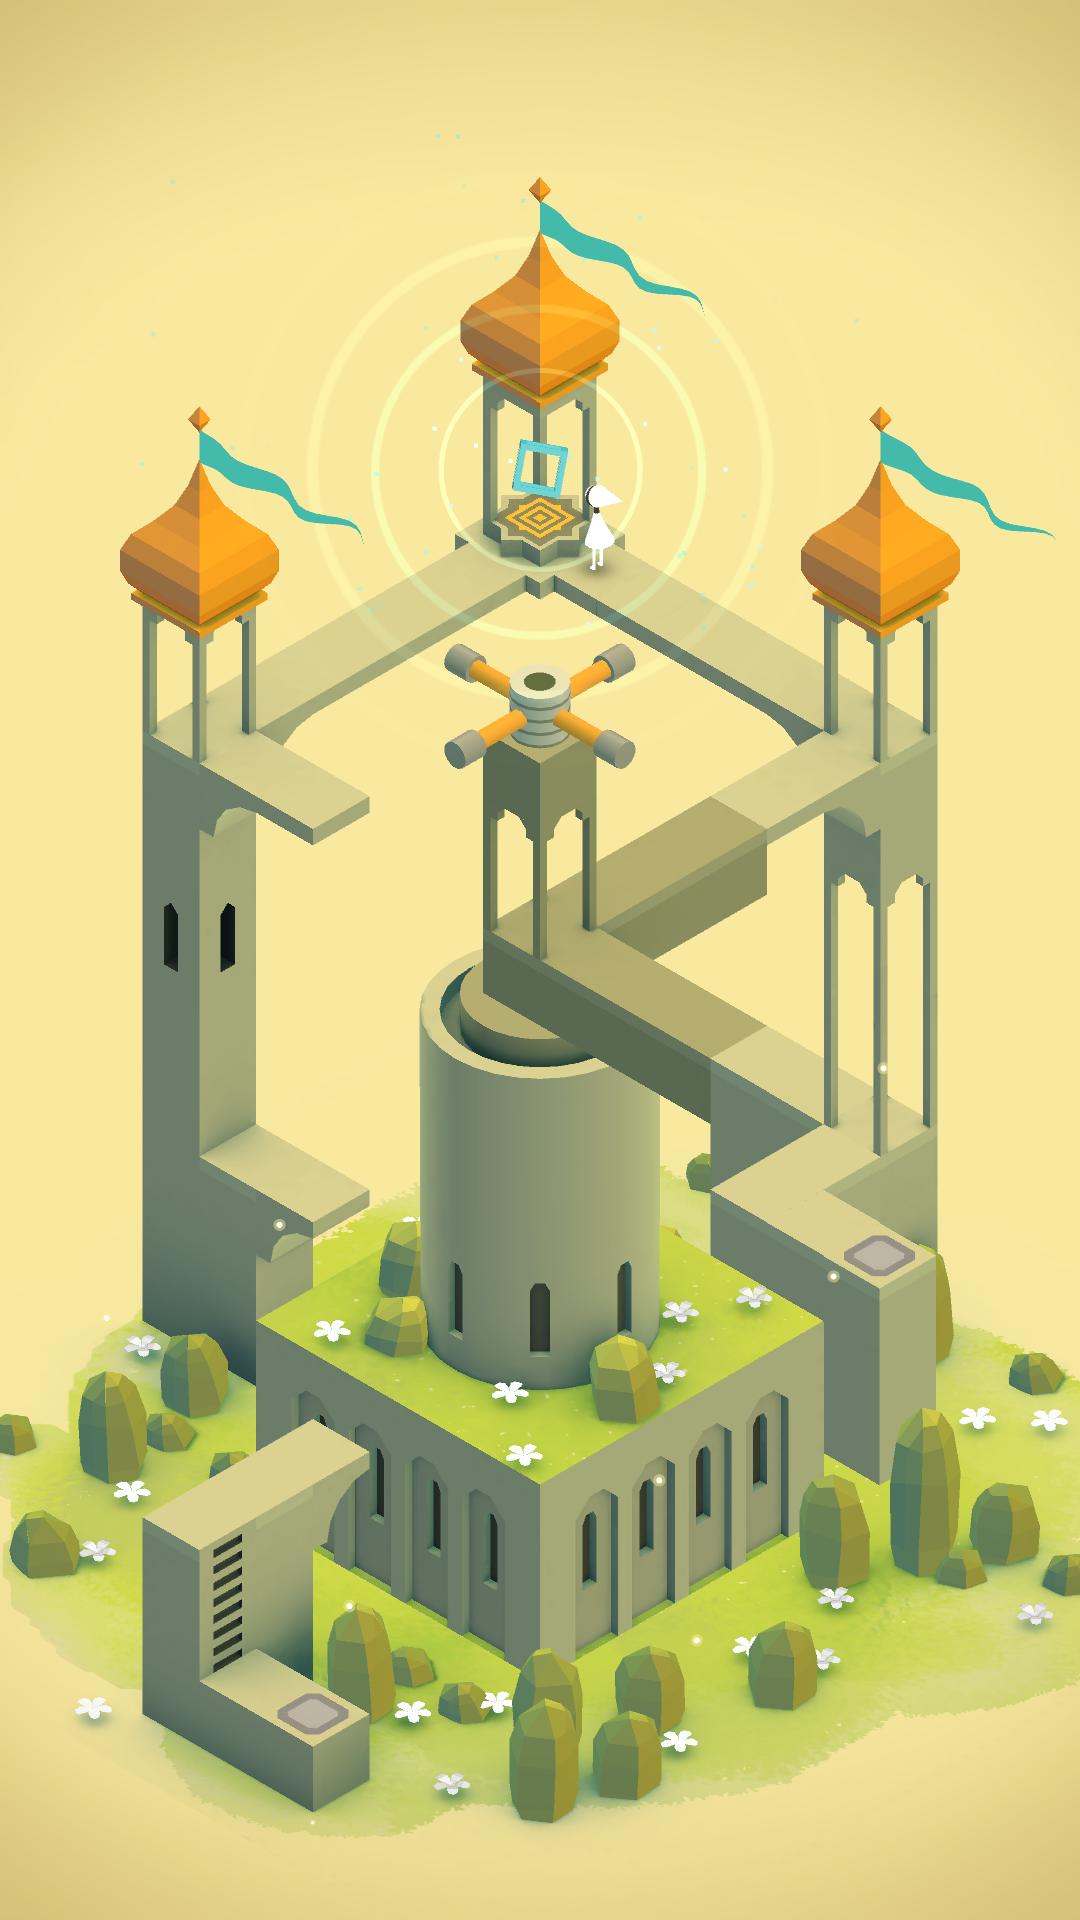 Best Hd 8 Bit Iphone Wallpaper - Monument Valley Game , HD Wallpaper & Backgrounds